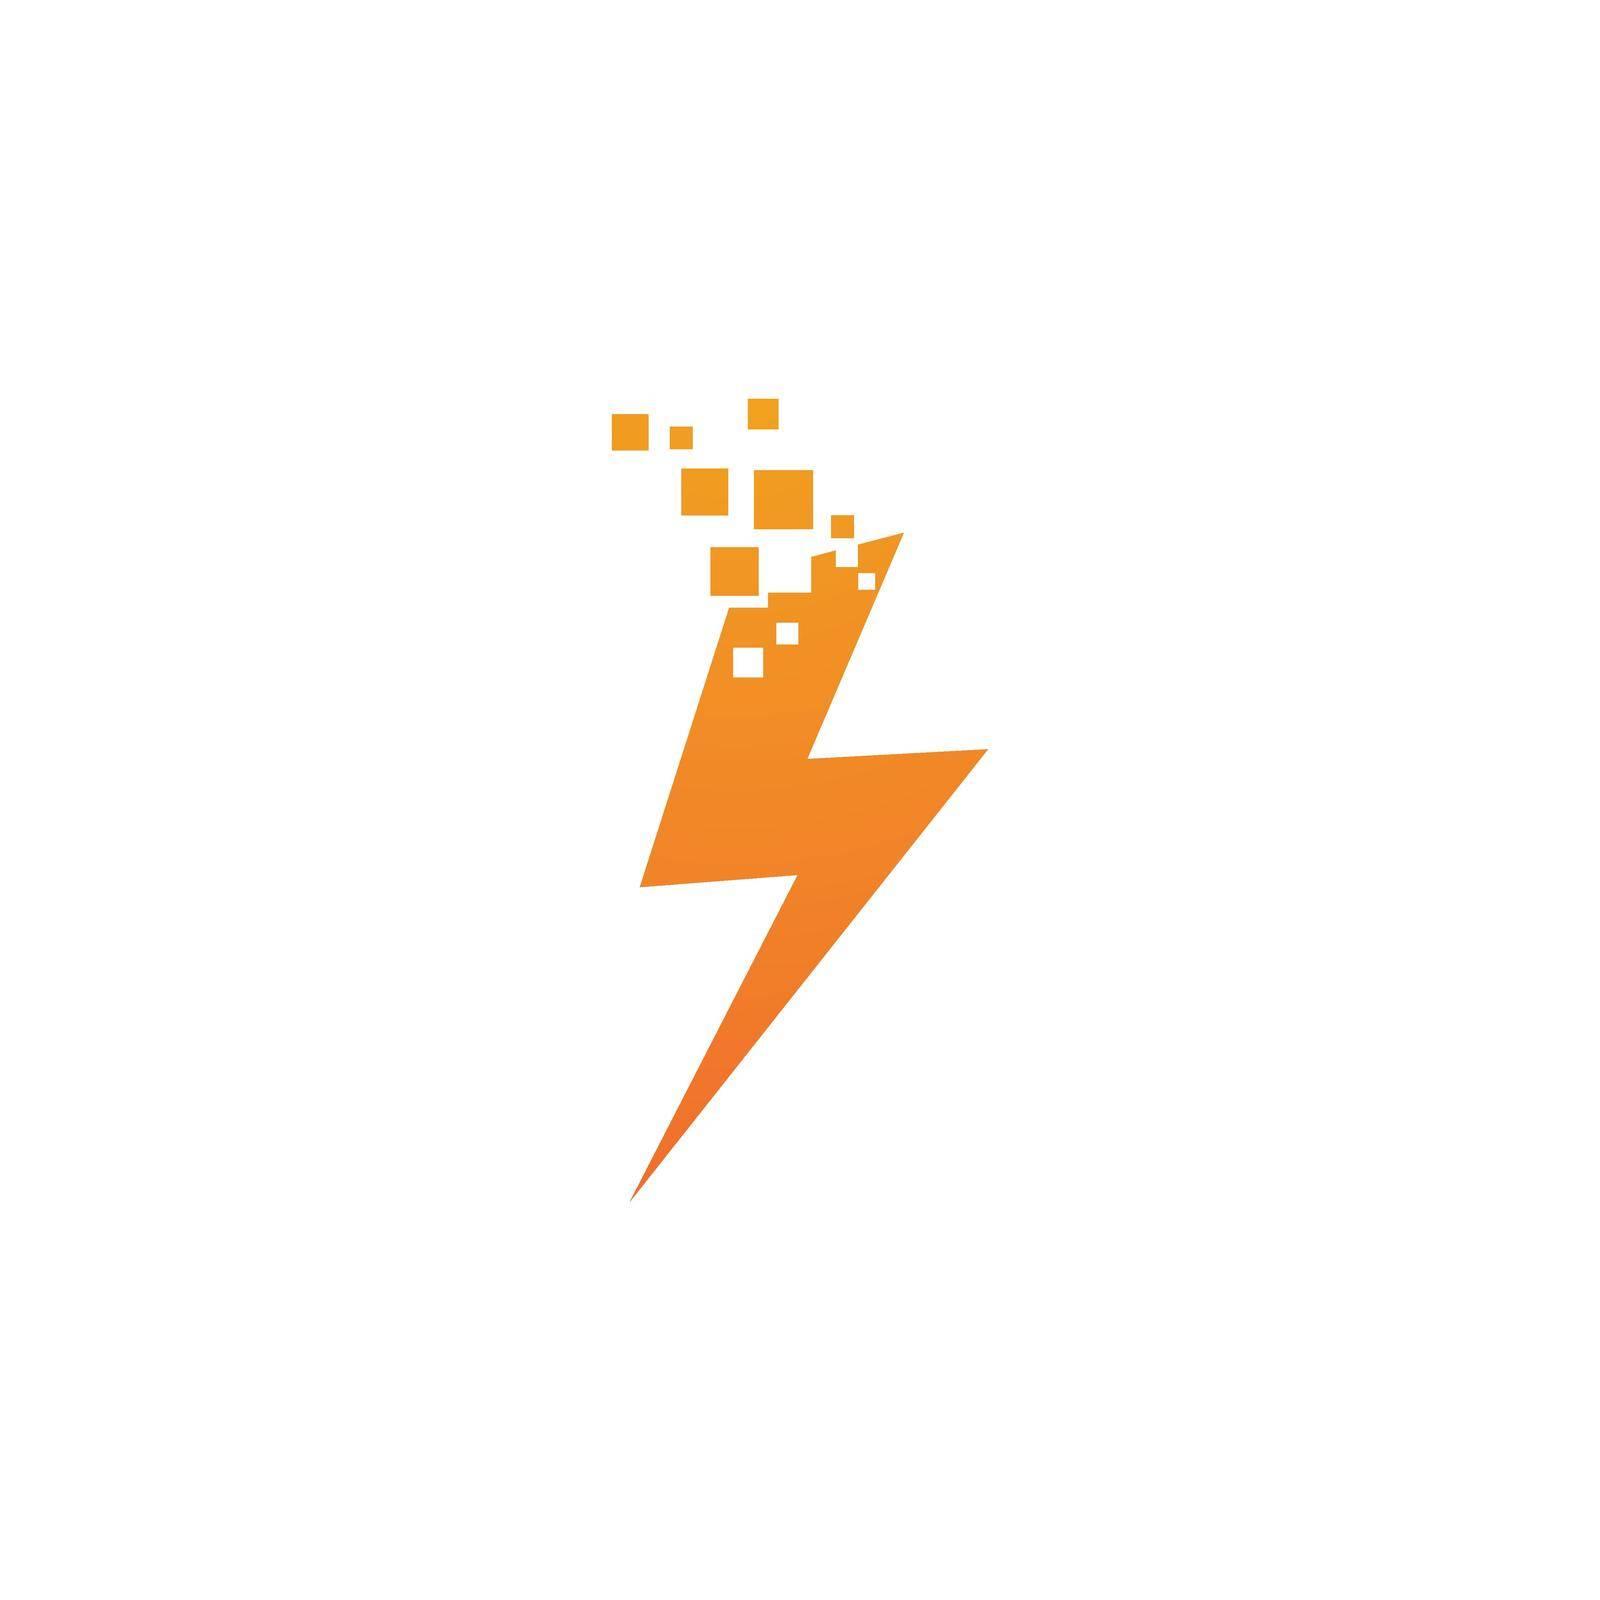 Power lightning logo vector design